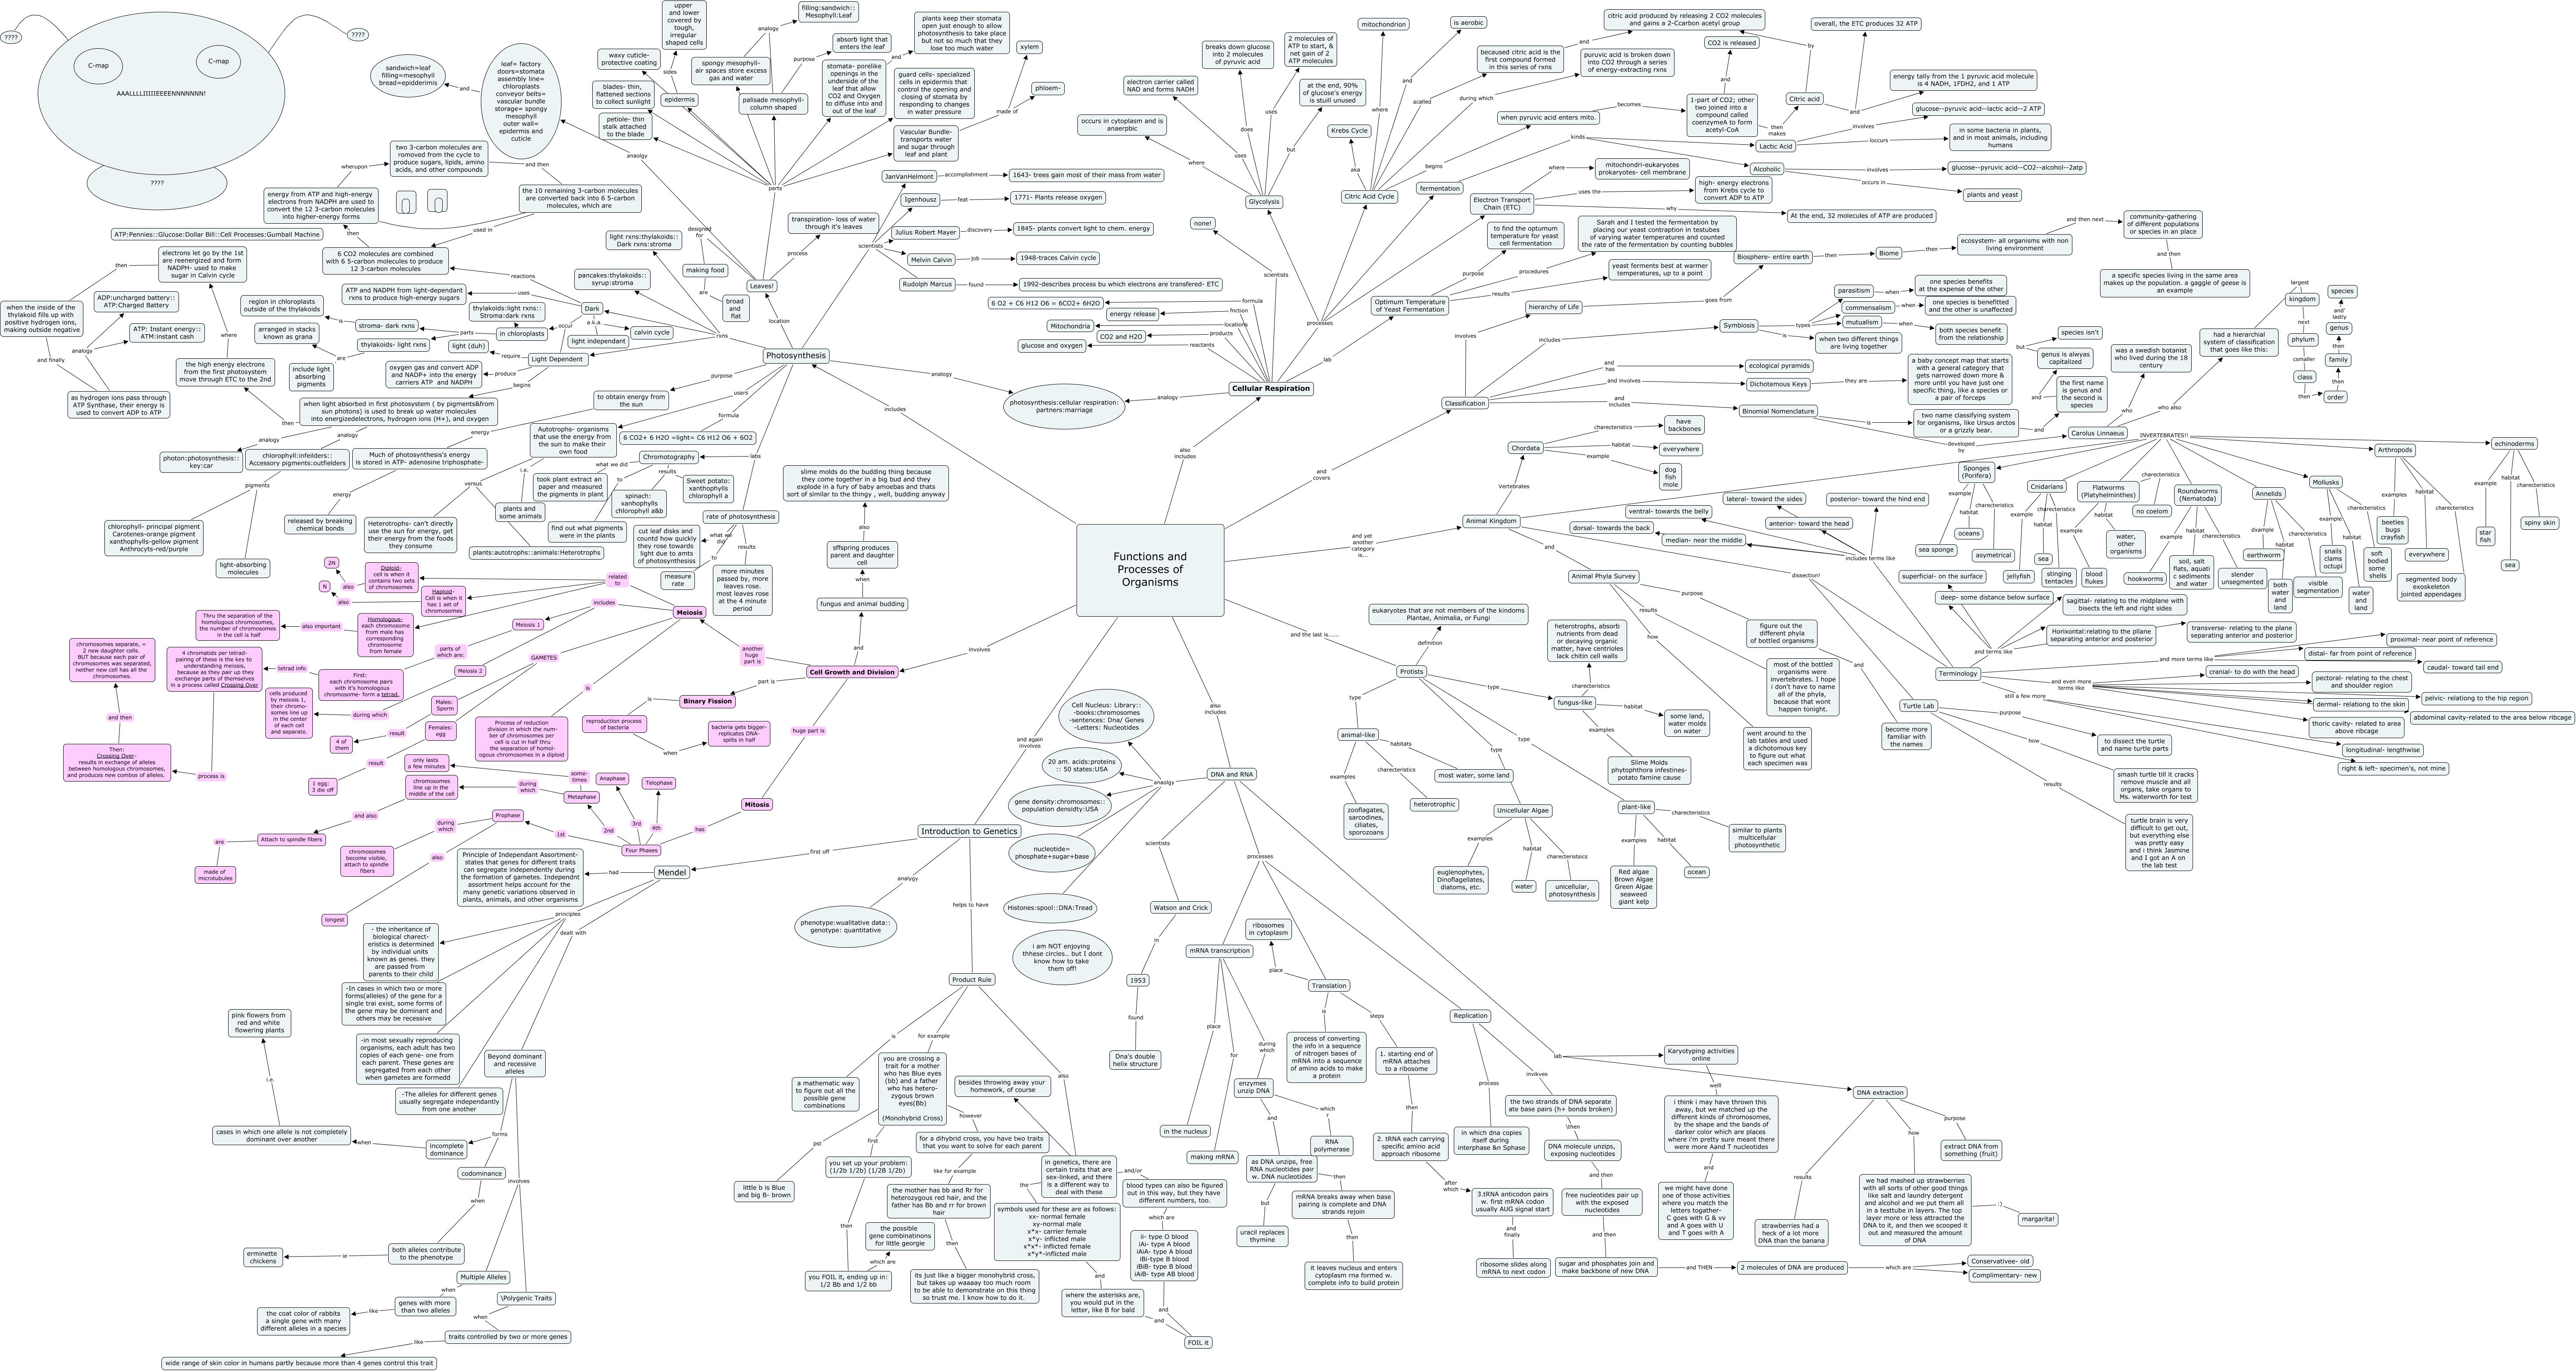 semester 2 concept map Joanna Ridgeway